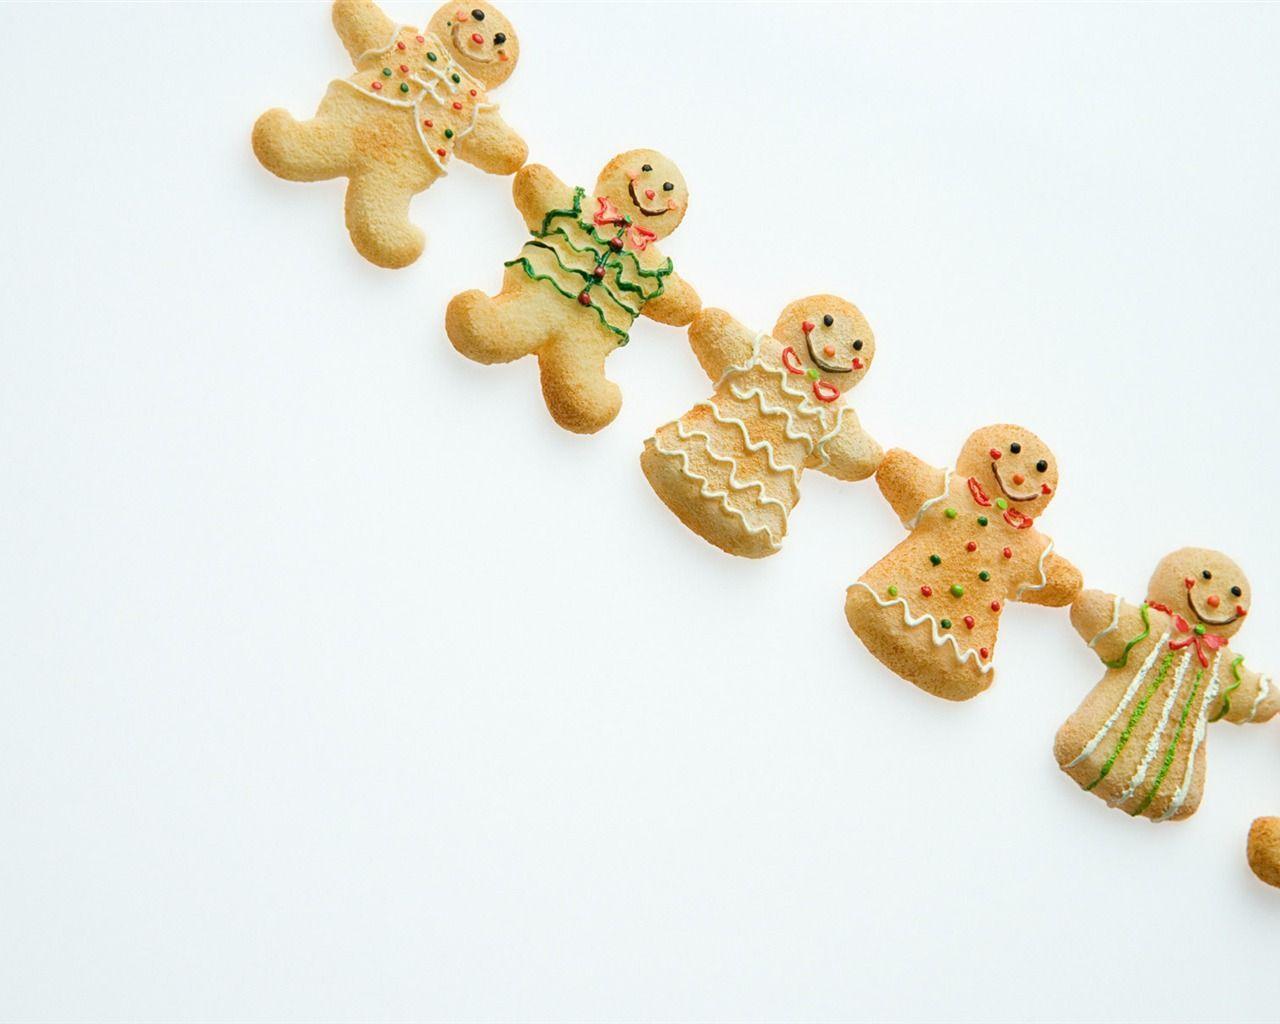 Gingerbread Man Wallpapers - Wallpaper - 75.6KB